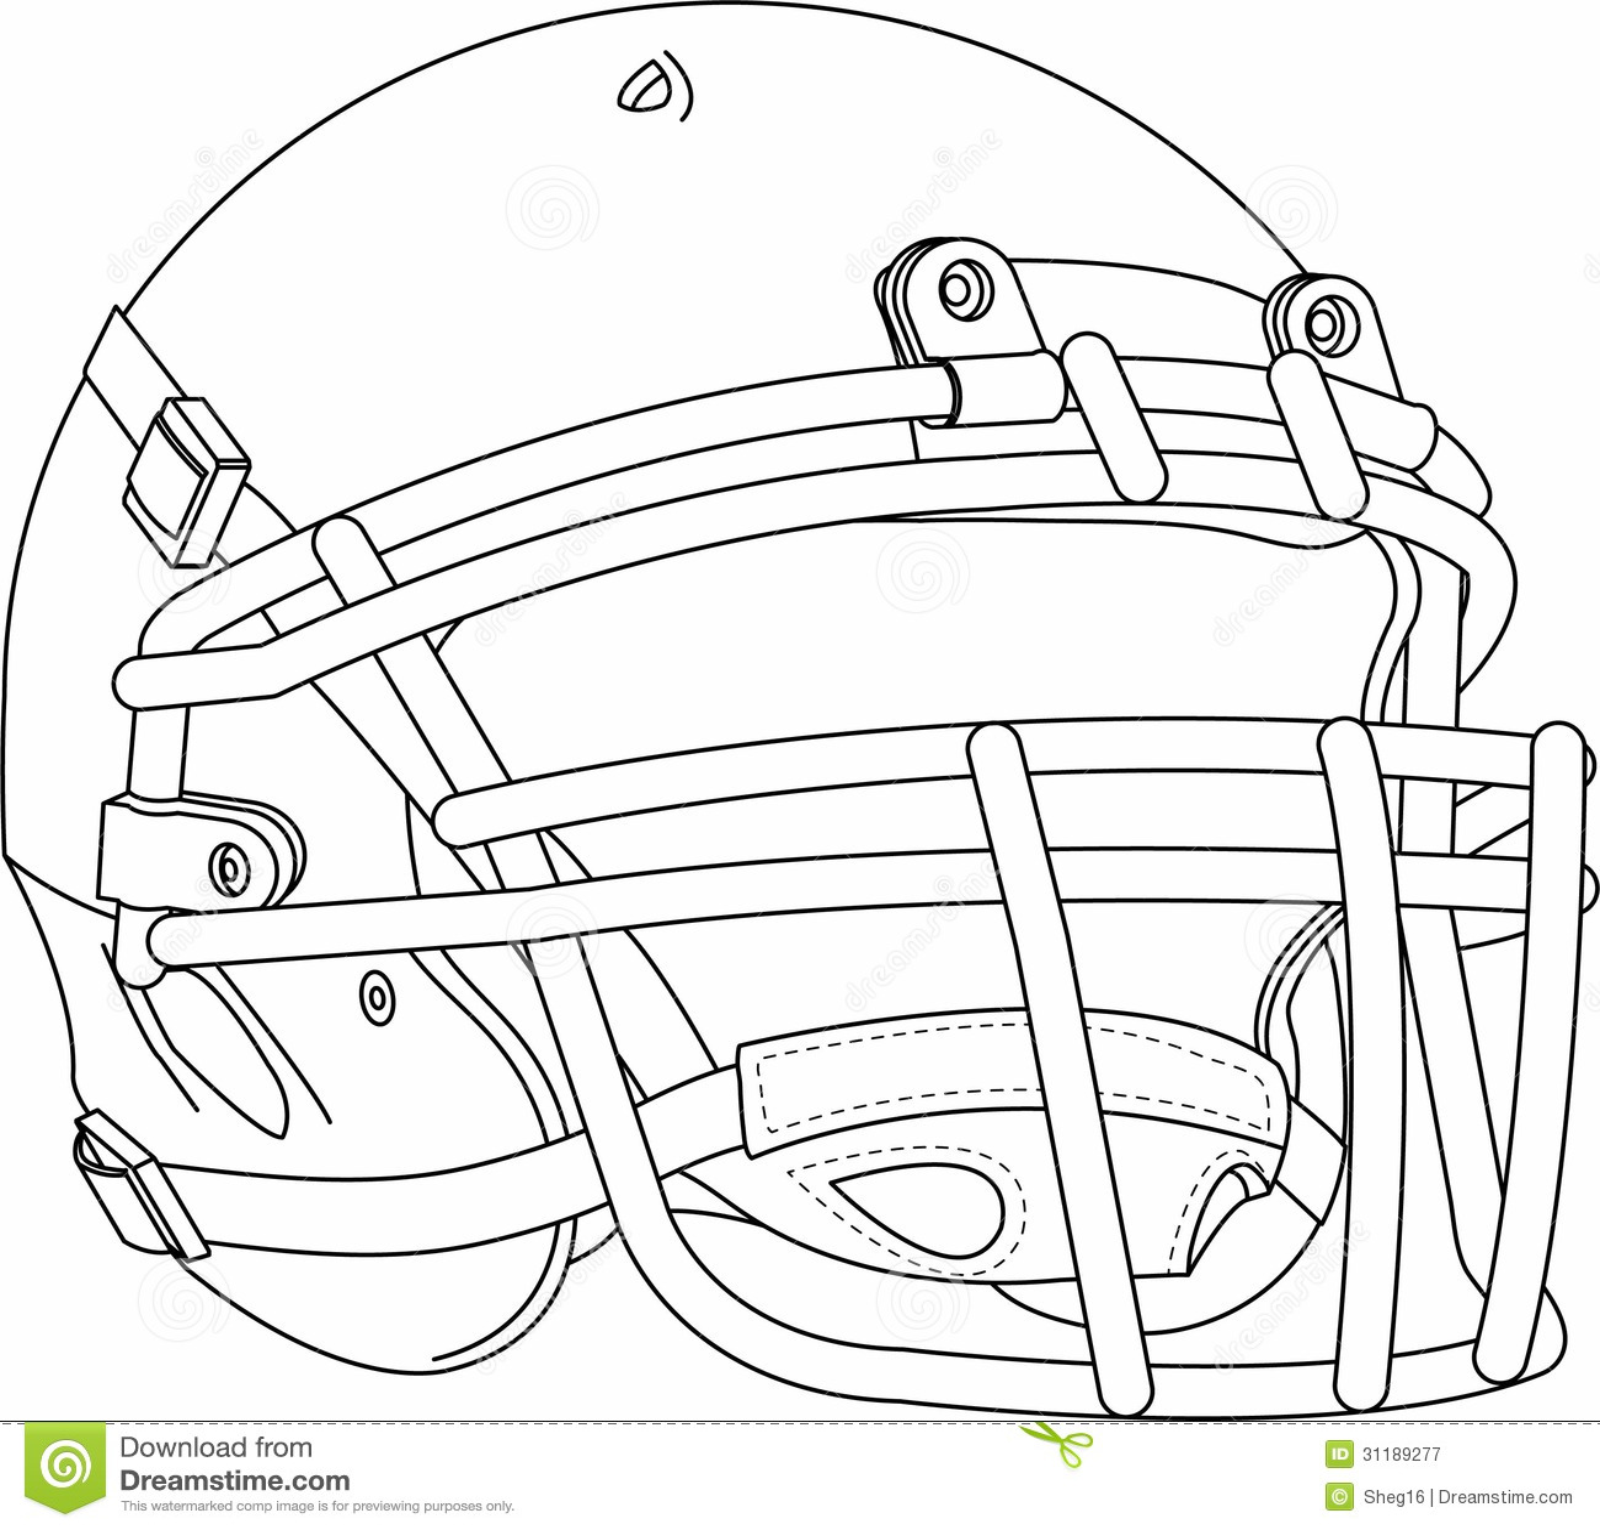 Football Helmet Royalty Free Stock Photography